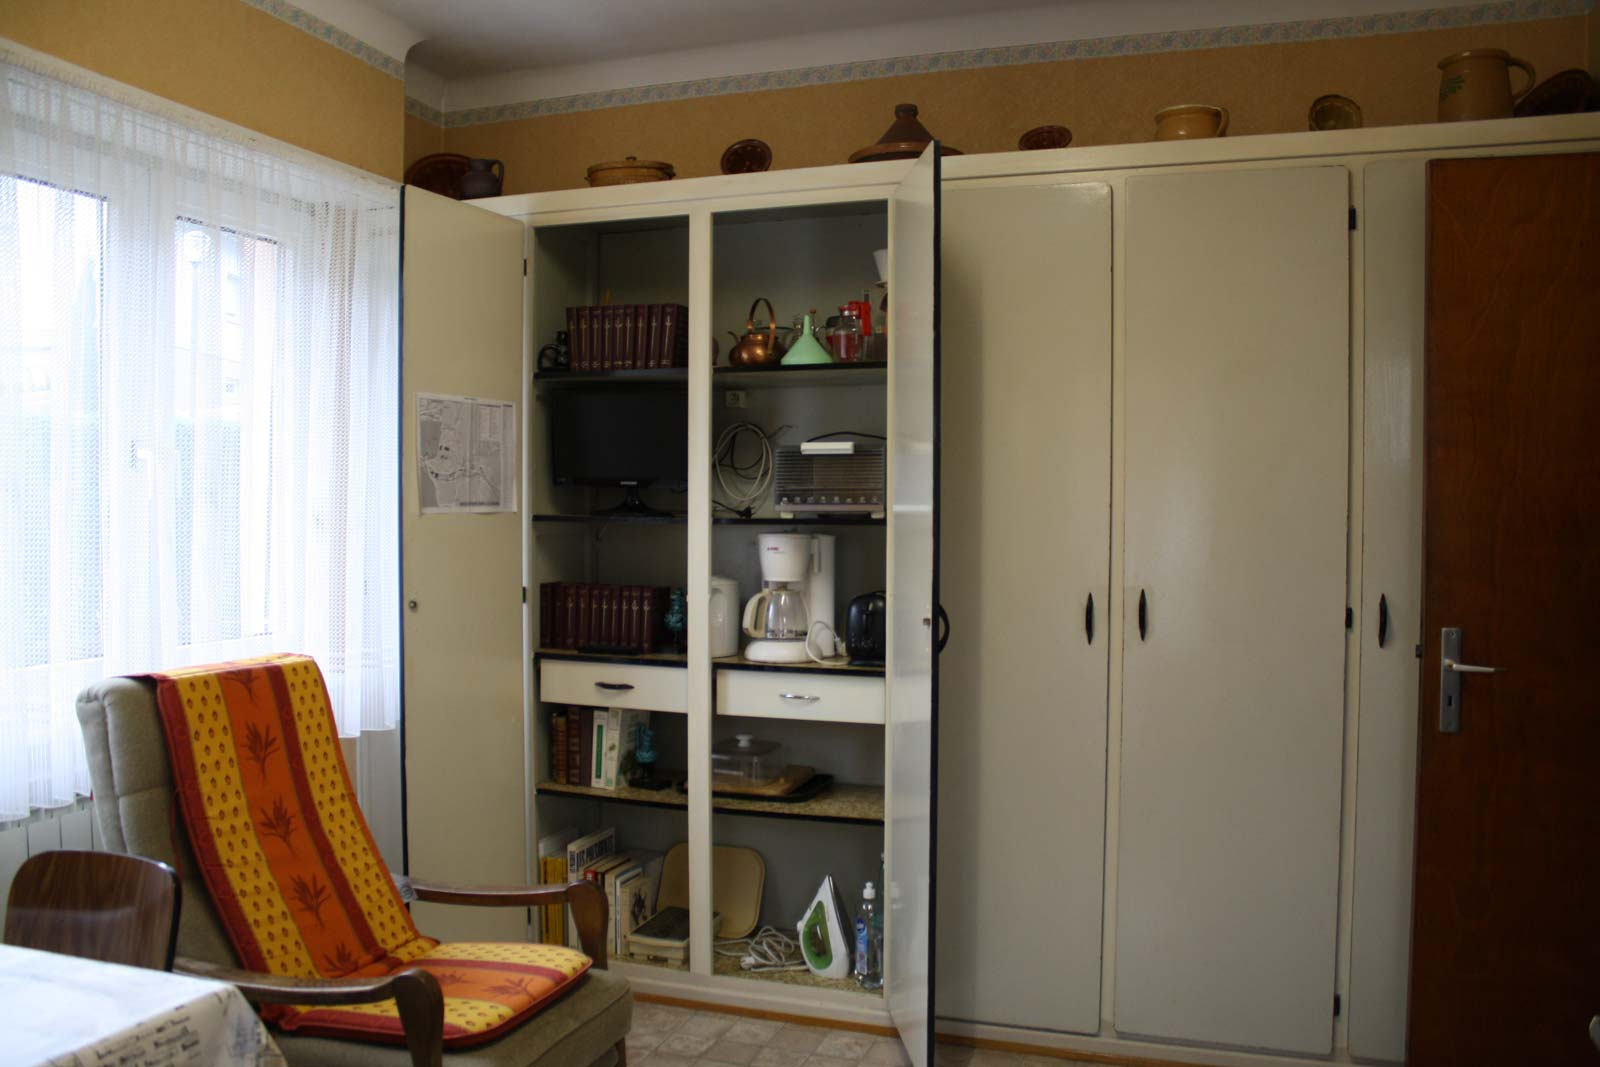 Accommodation of Mr. Ohlmann